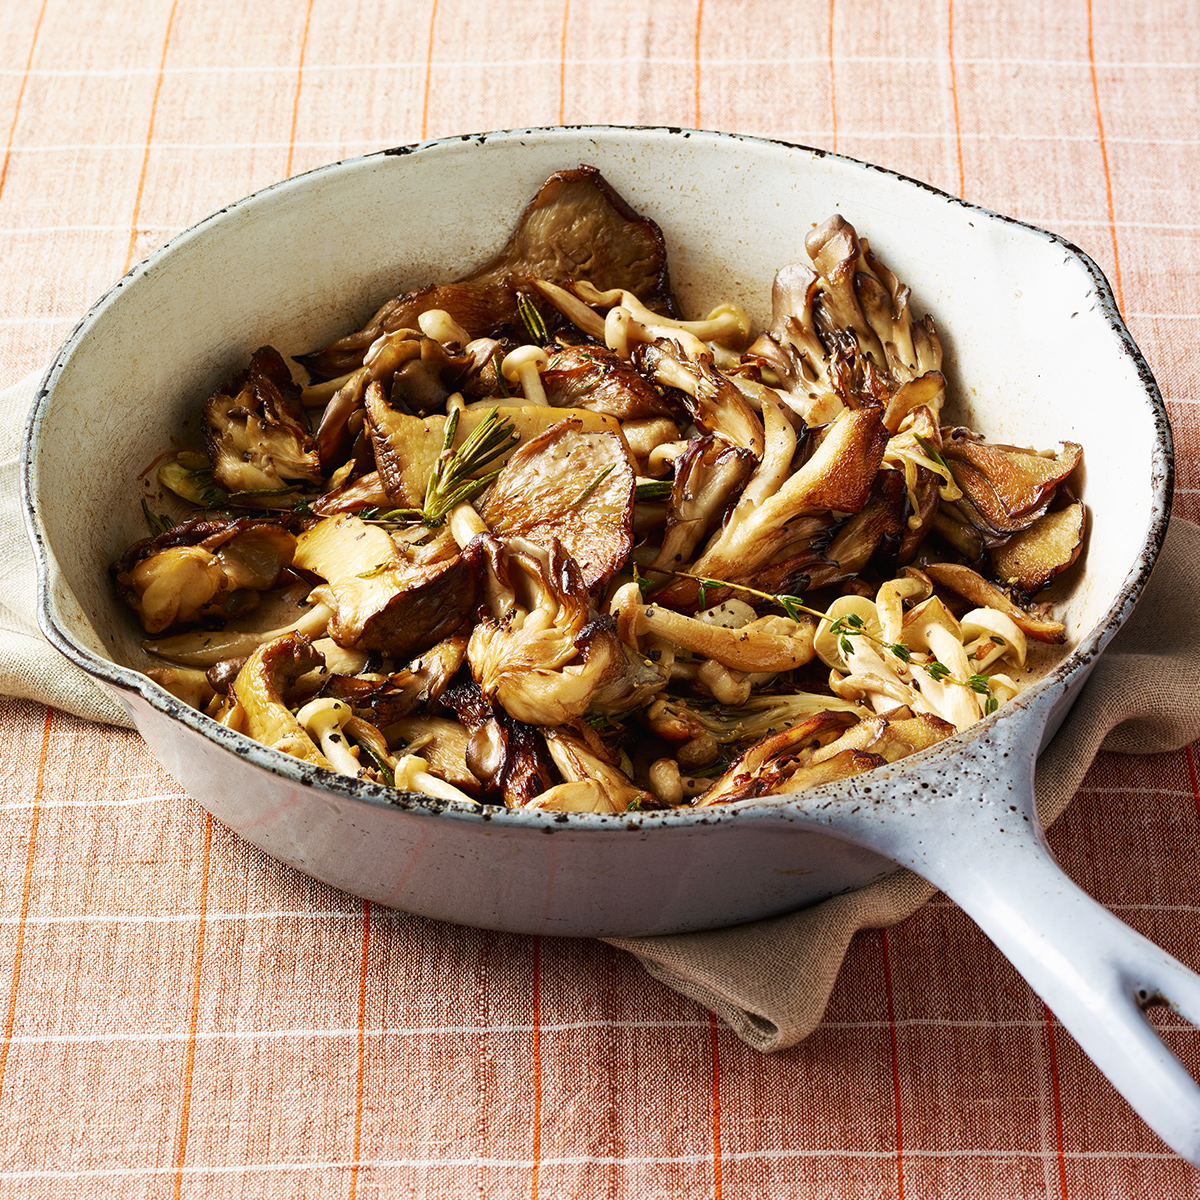 pan roasted rosemary mushrooms